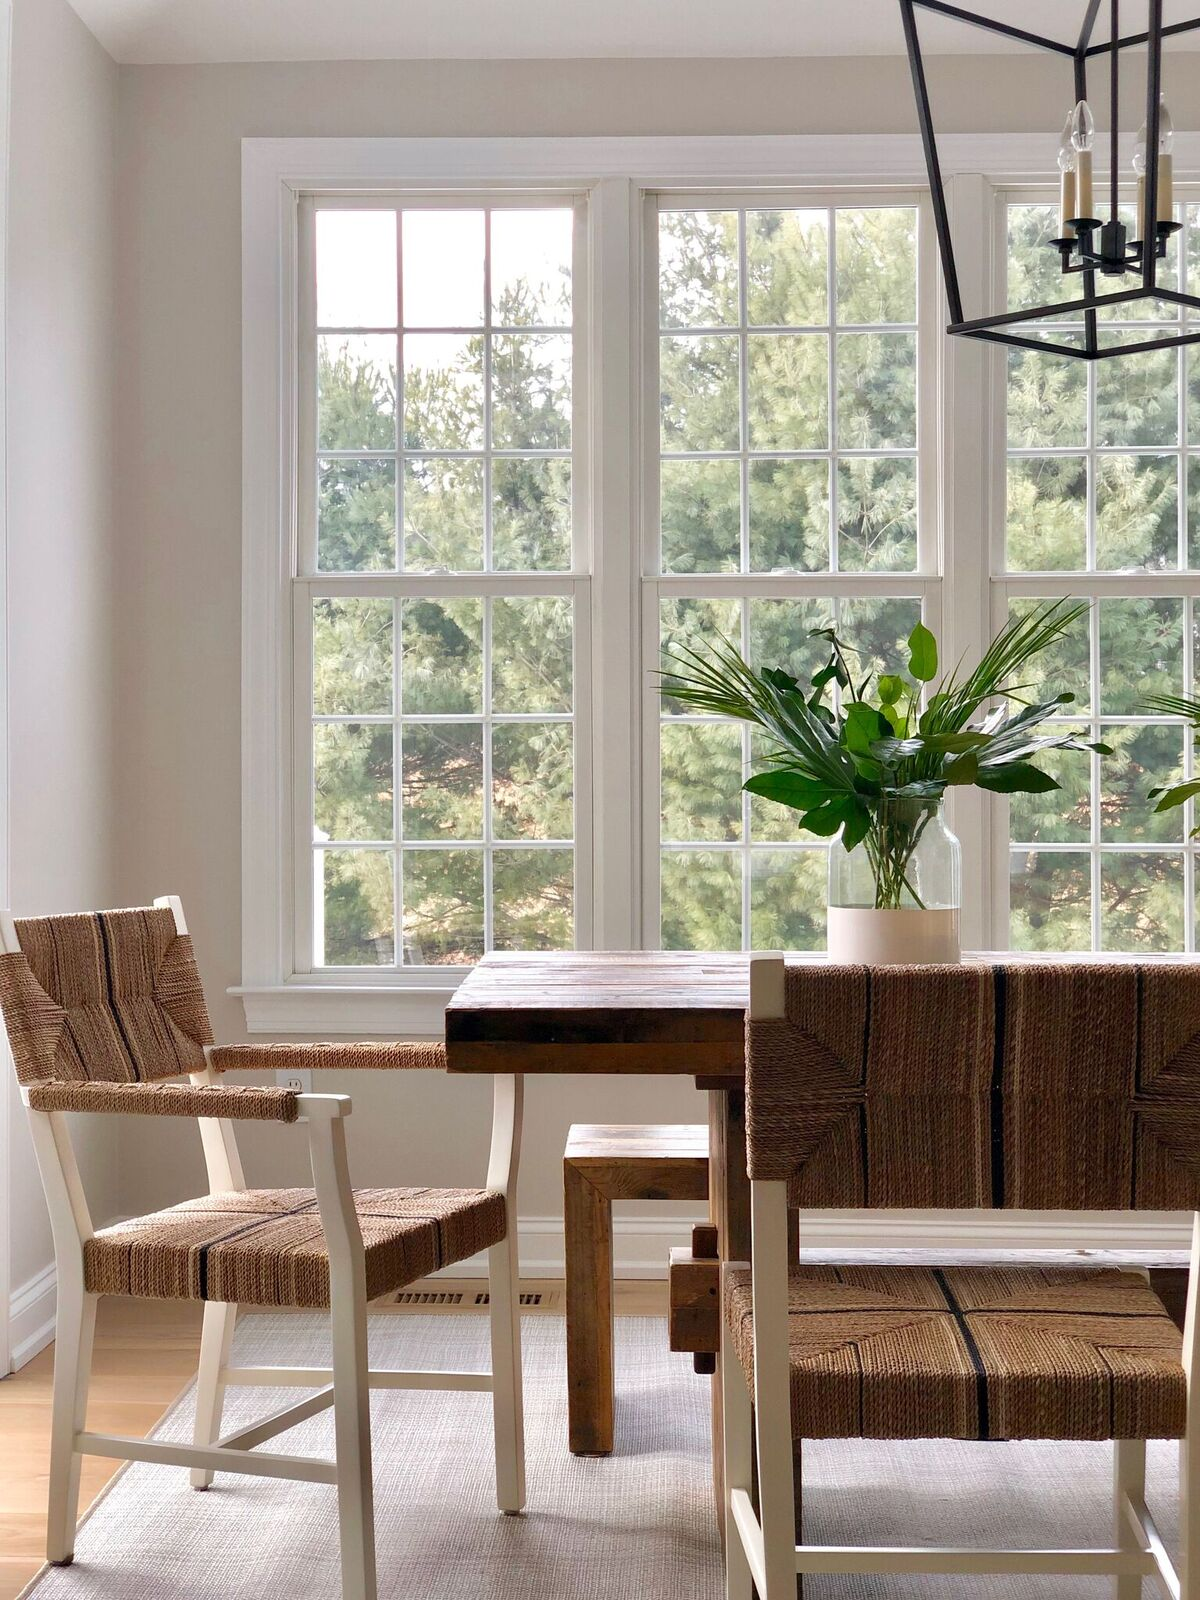 stephanie-kraus-designs-mainline-pa-project-wood-chairs-breakfast area.jpg